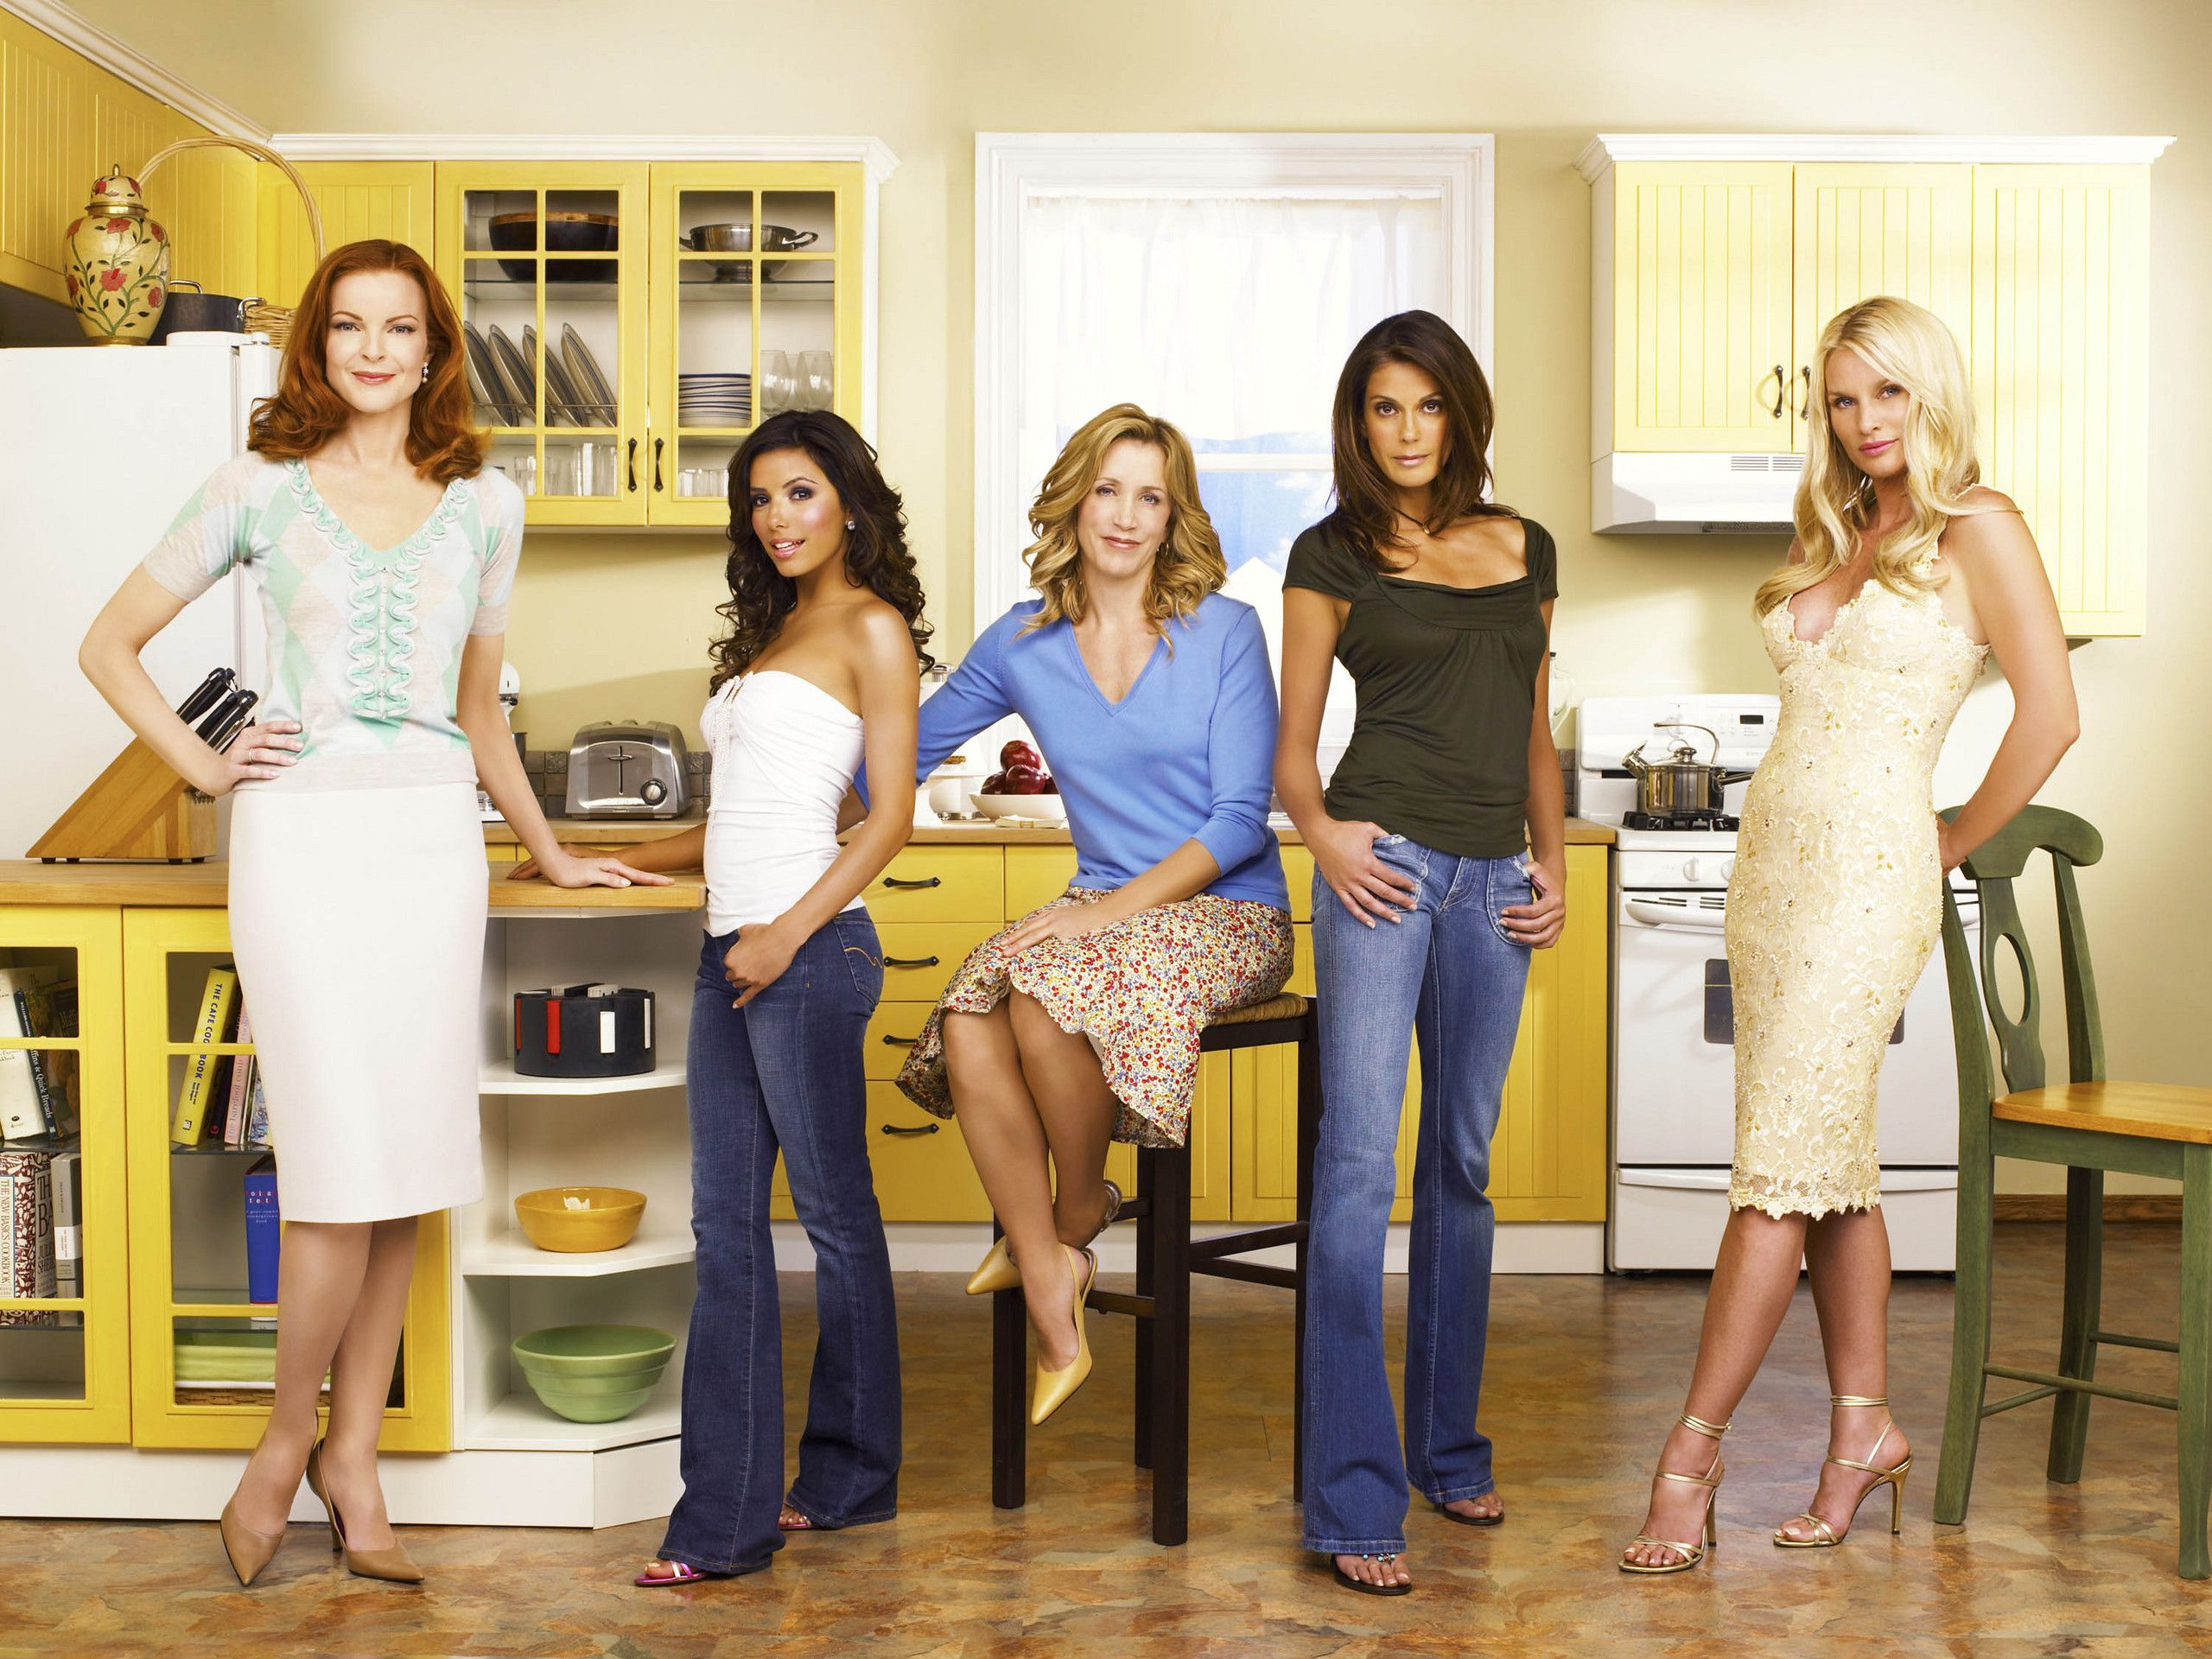 House design tv series - Susan Mayer Lynette Scavo Bree Van De Kamp Gabrielle Solis Edie Britt Desperate Housewives Housetv